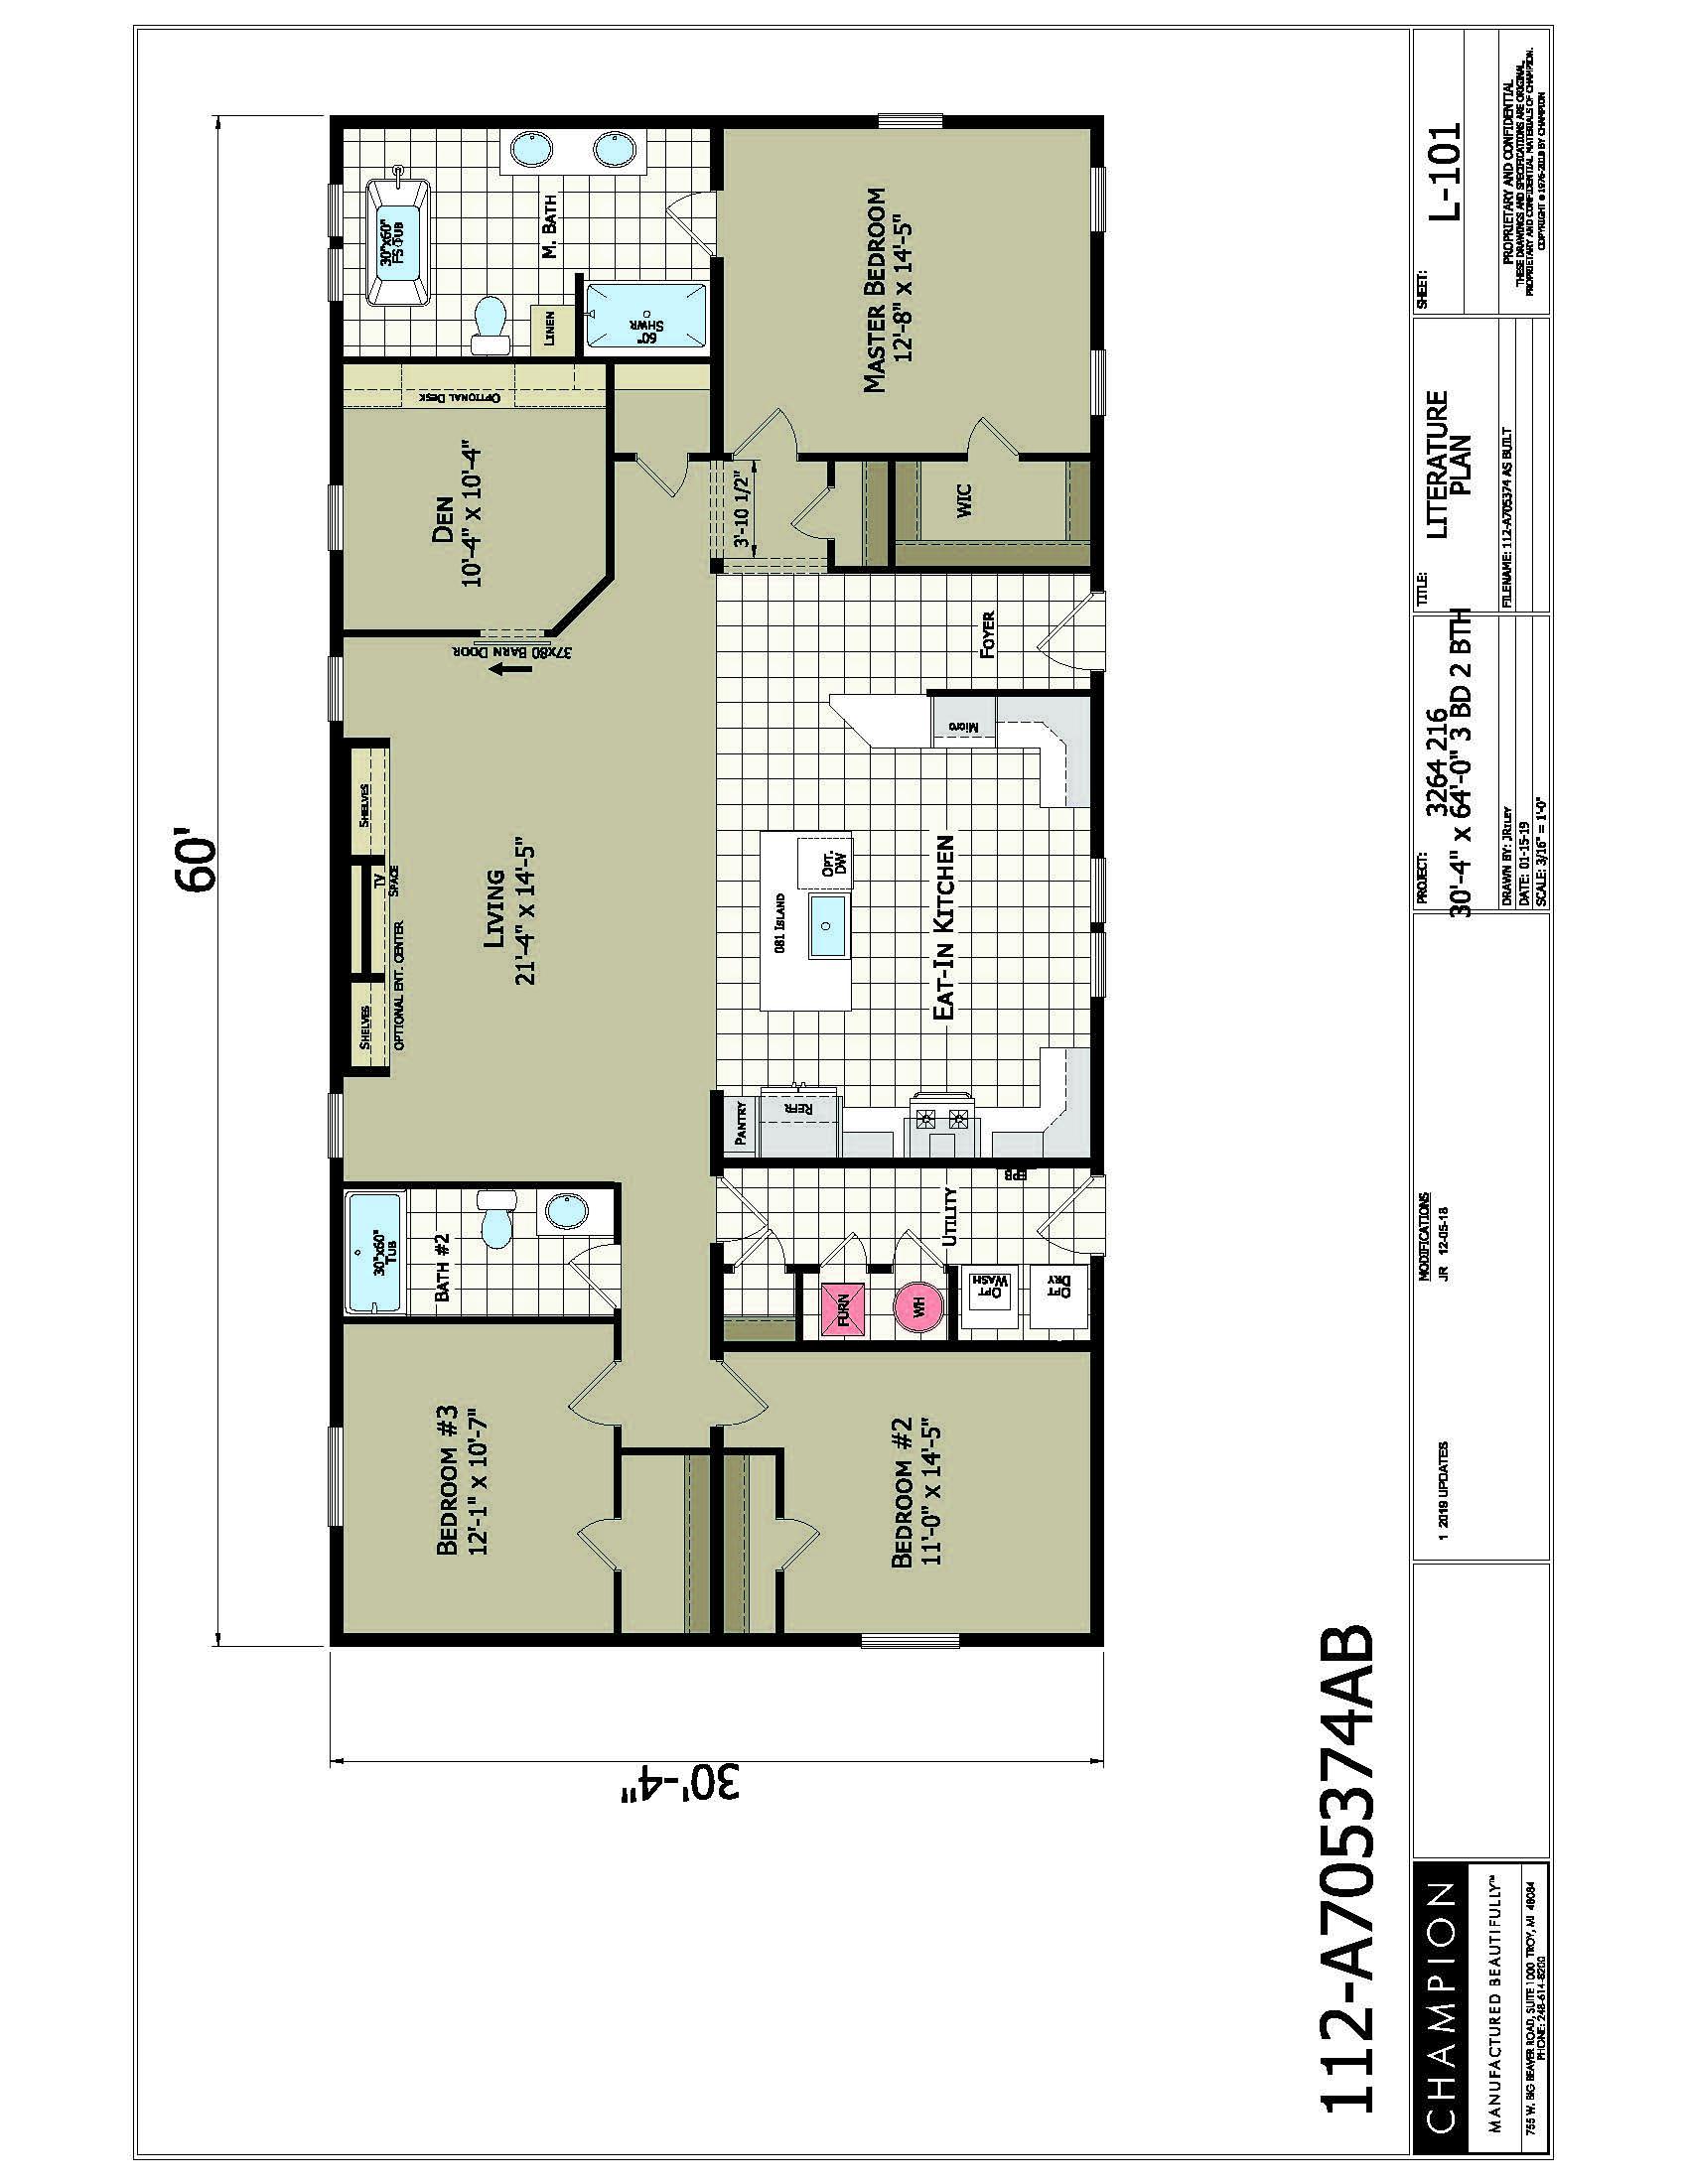 floorplan image for unit 349